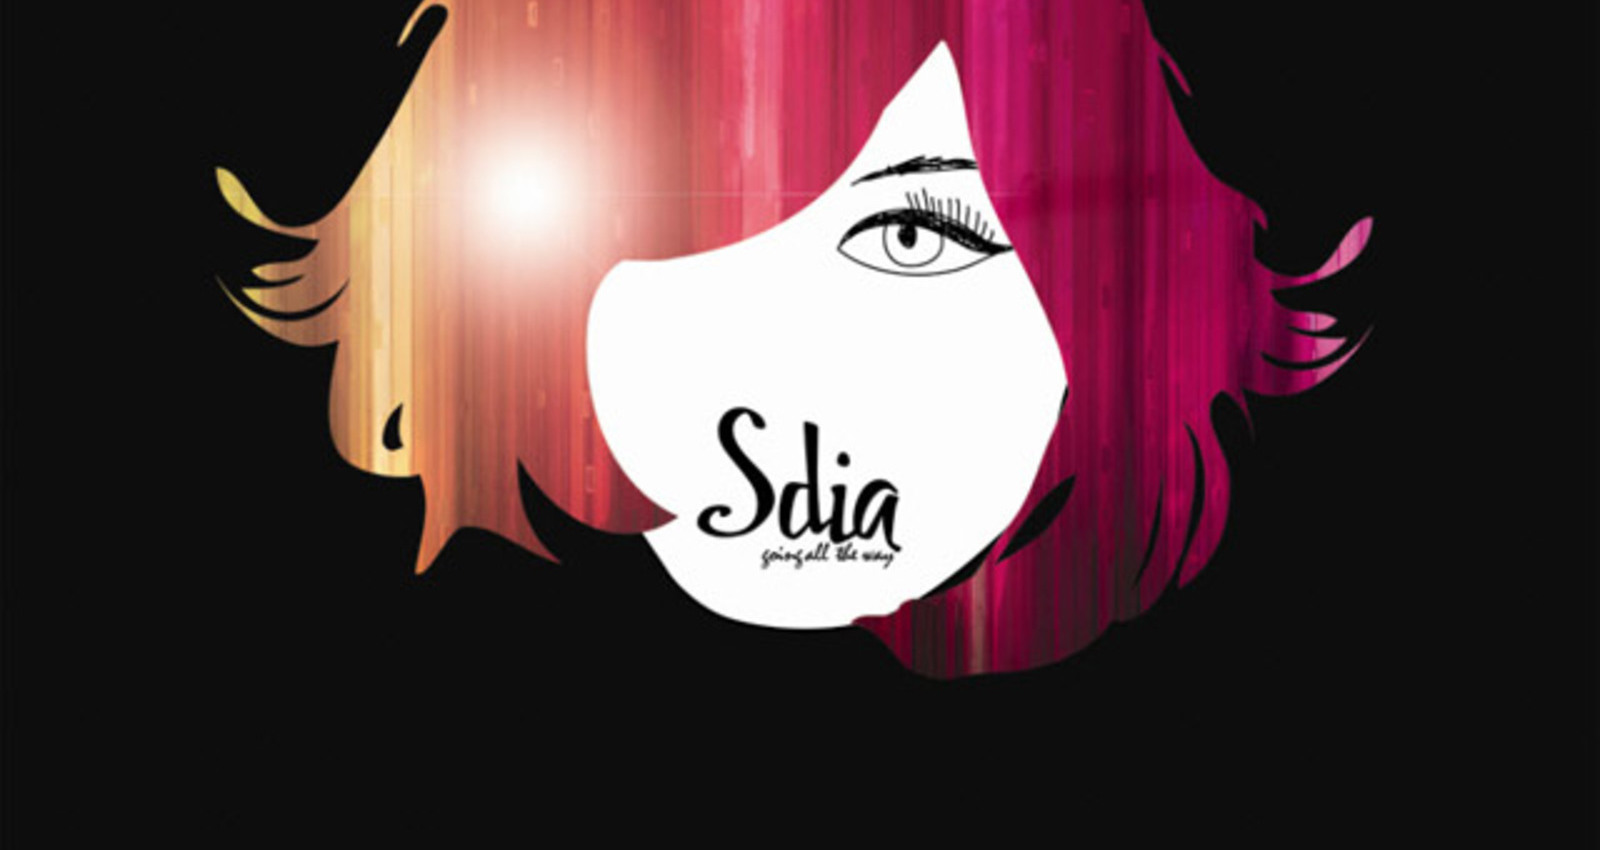 SDIA Project